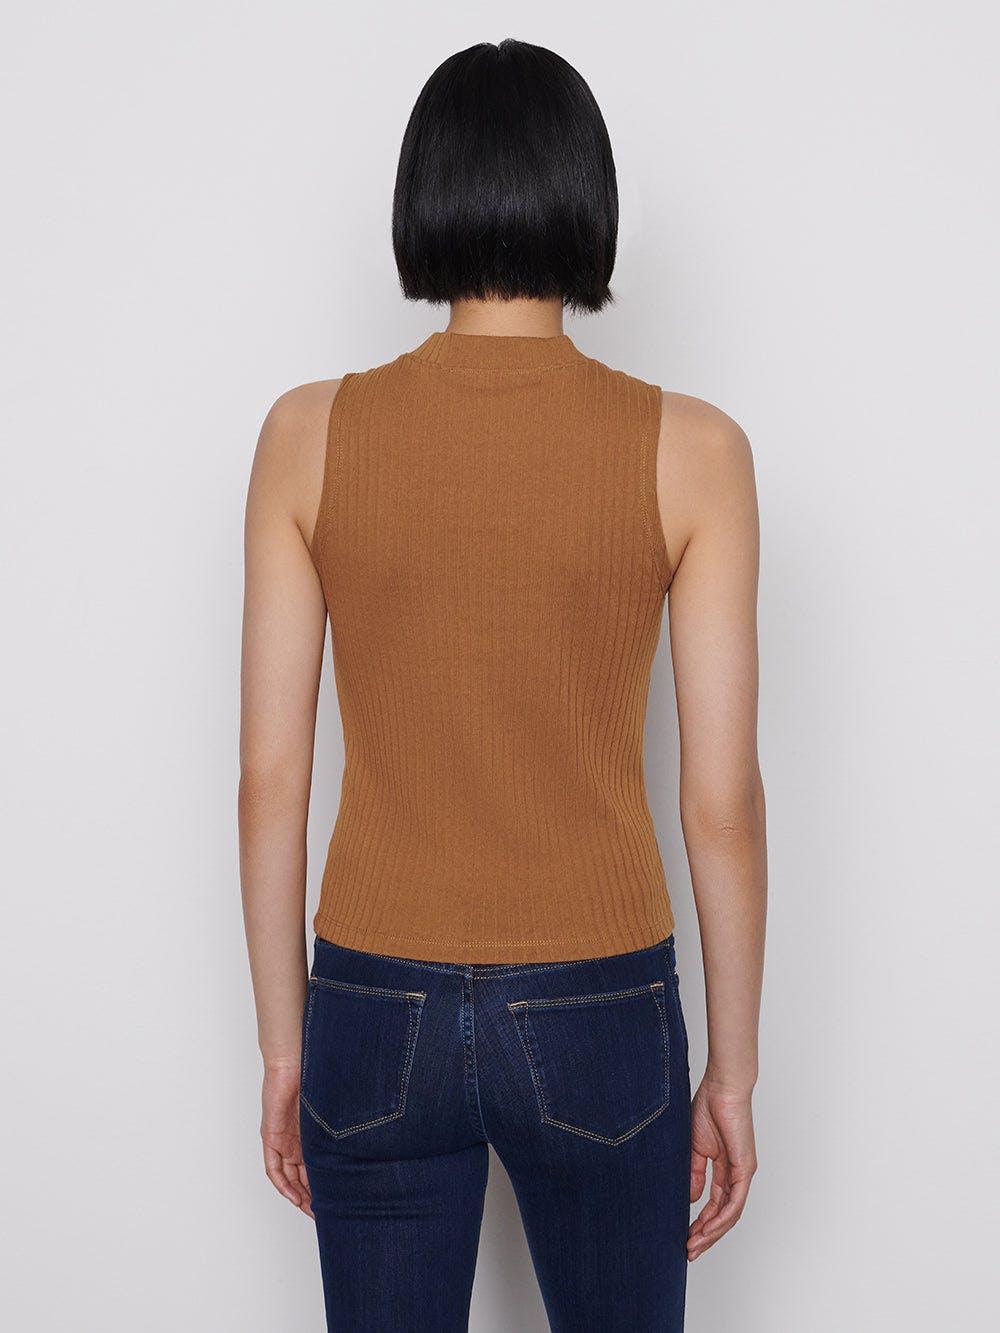 shirt back view